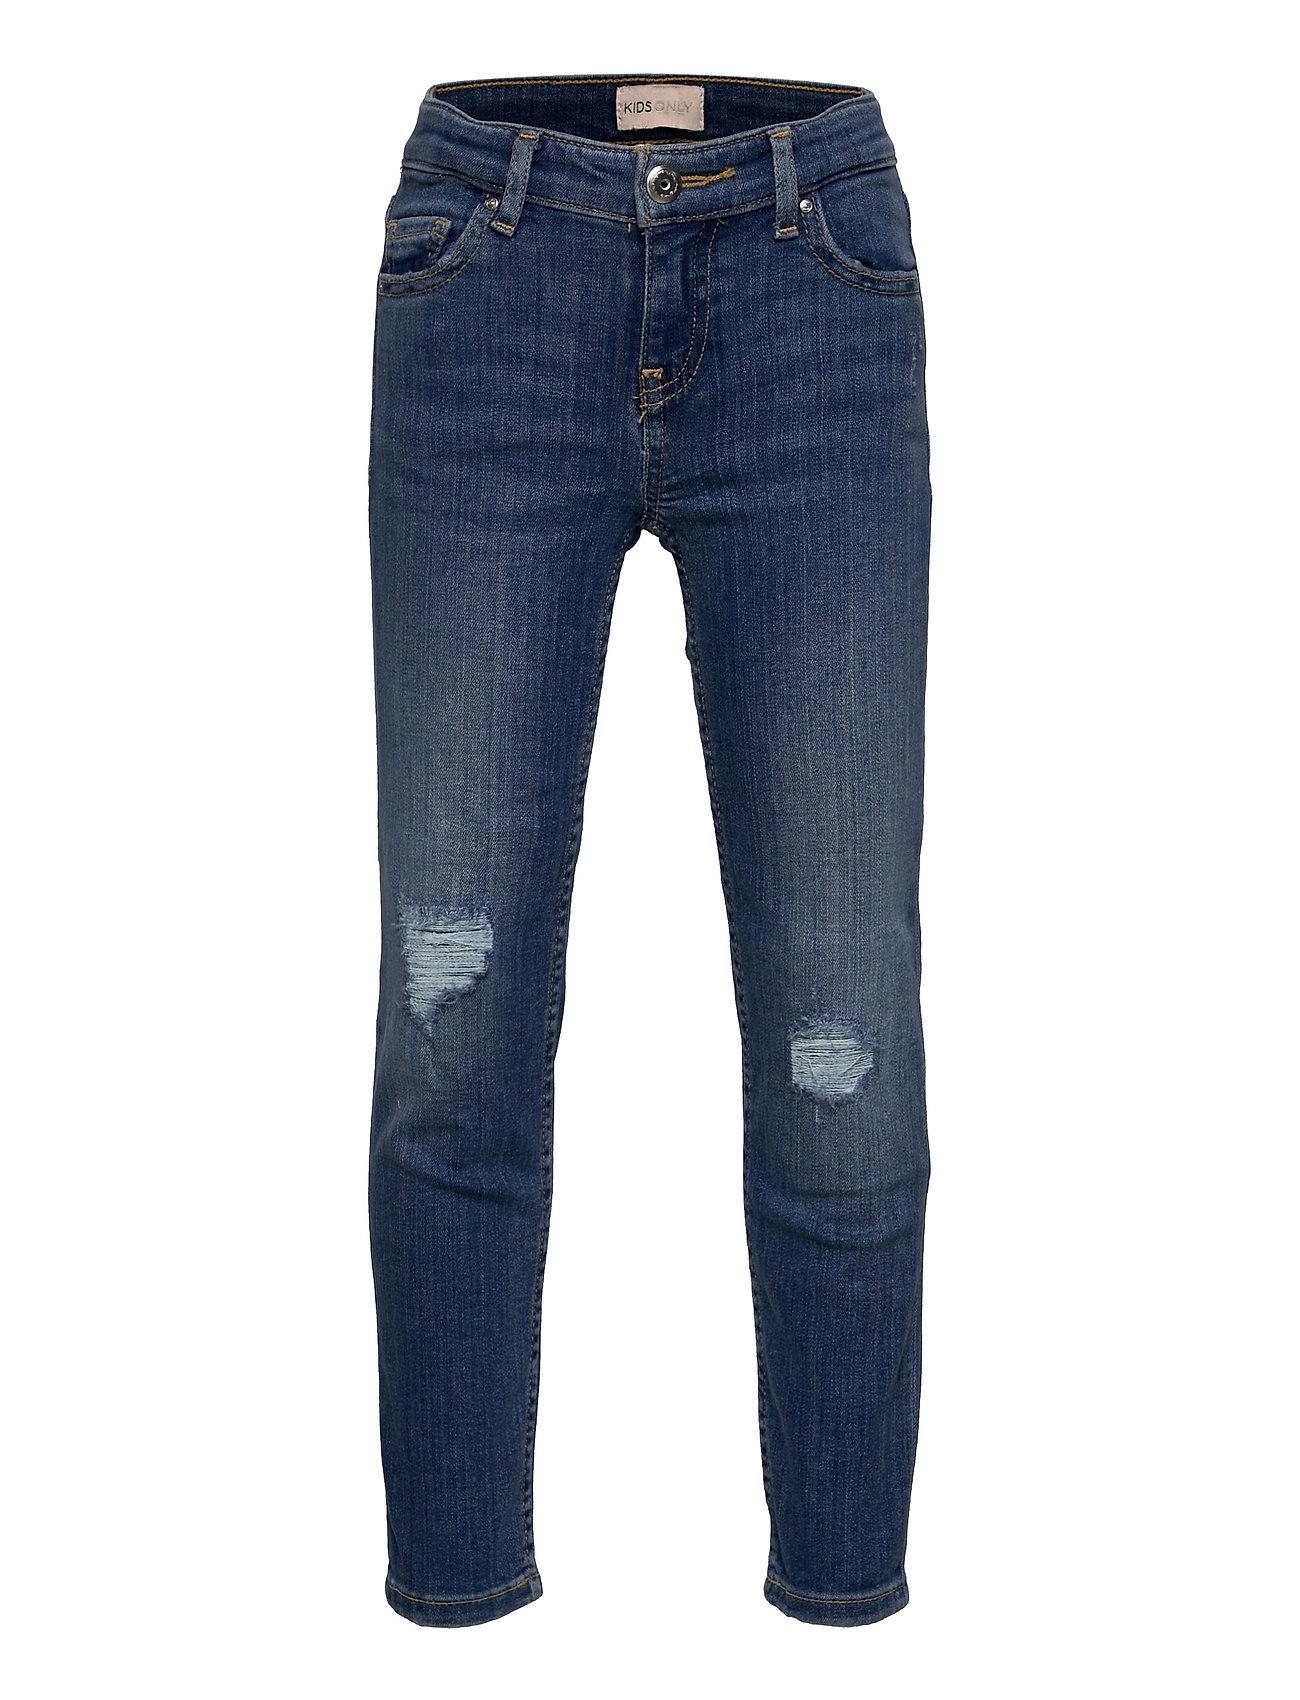 Konsophie Straight Ank Dest Dnm Cre681 Jeans Blå Kids Only